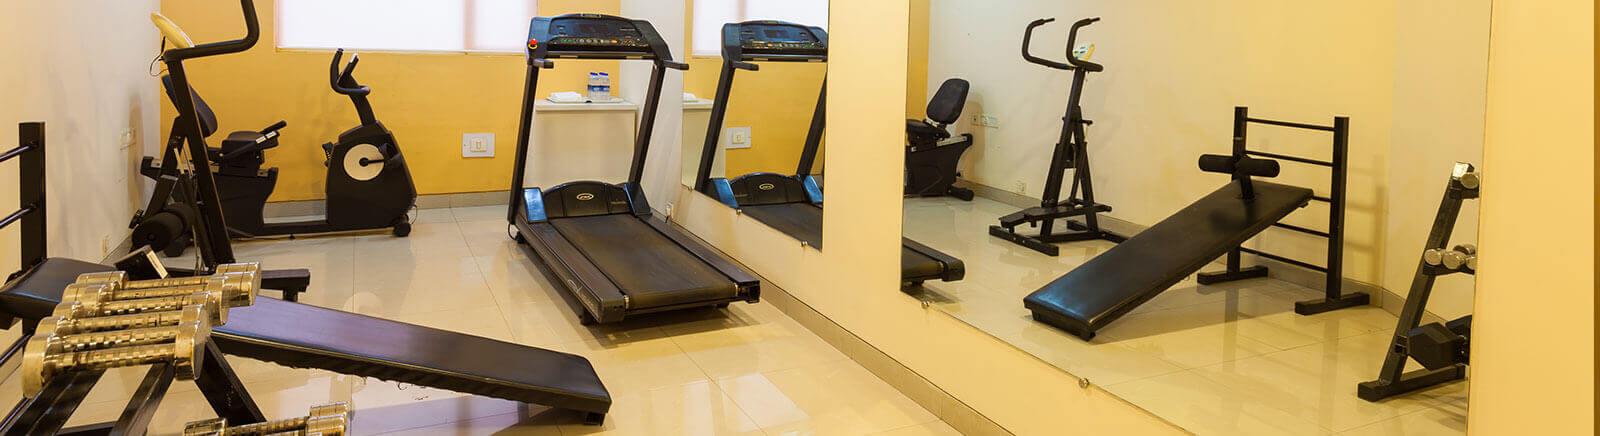 Ginger Nashik Hotel Services & Facilities